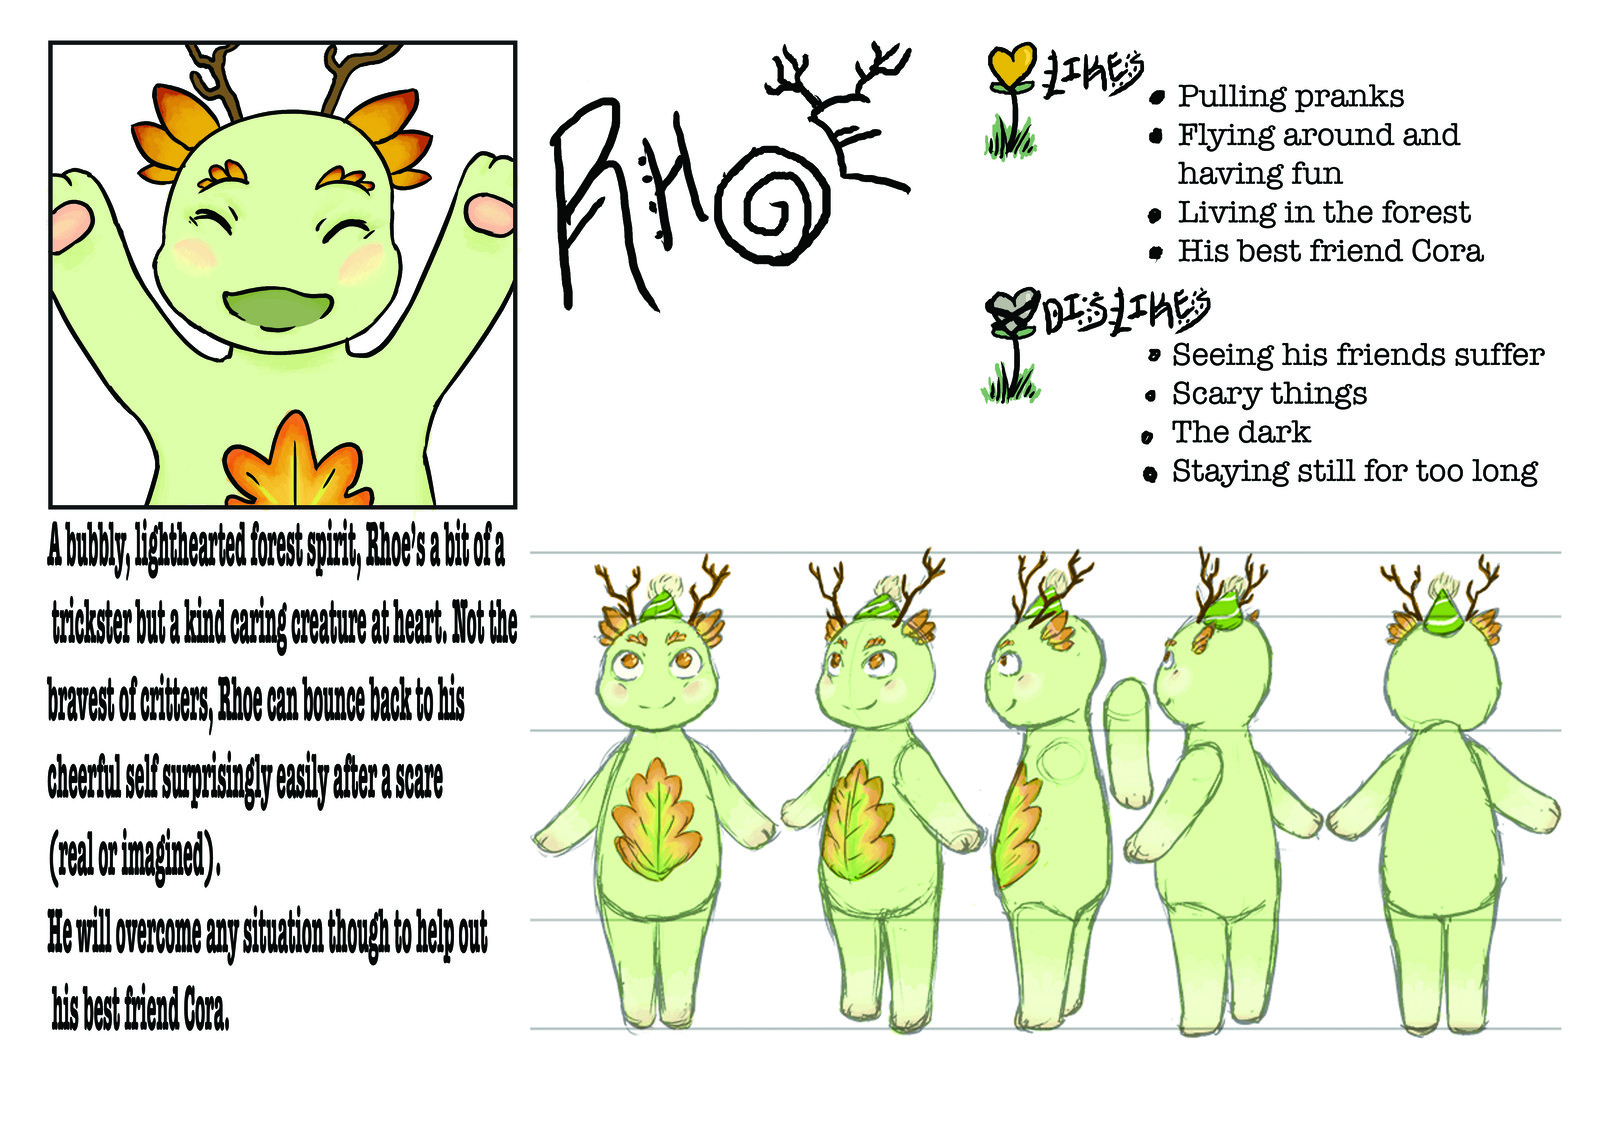 Rhoe Character Profile